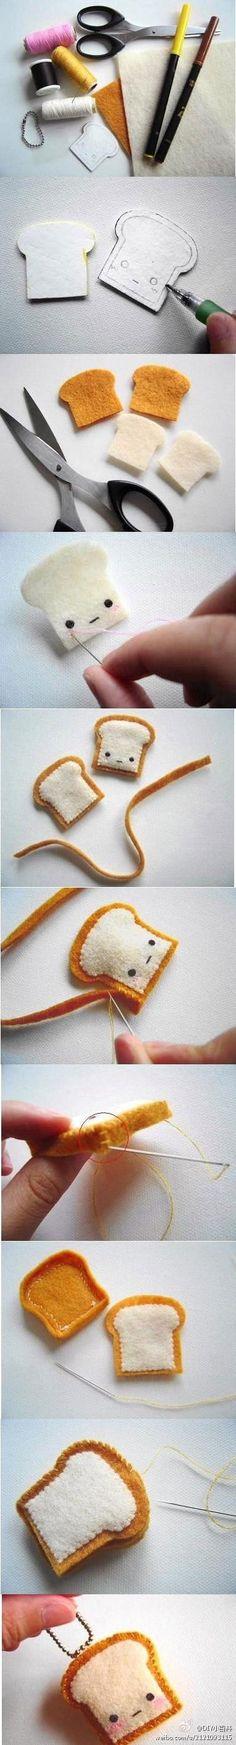 Súper linda tostada hecha de fieltro. DIY o HTM (Hazlo Tu Misma). Tutorial.